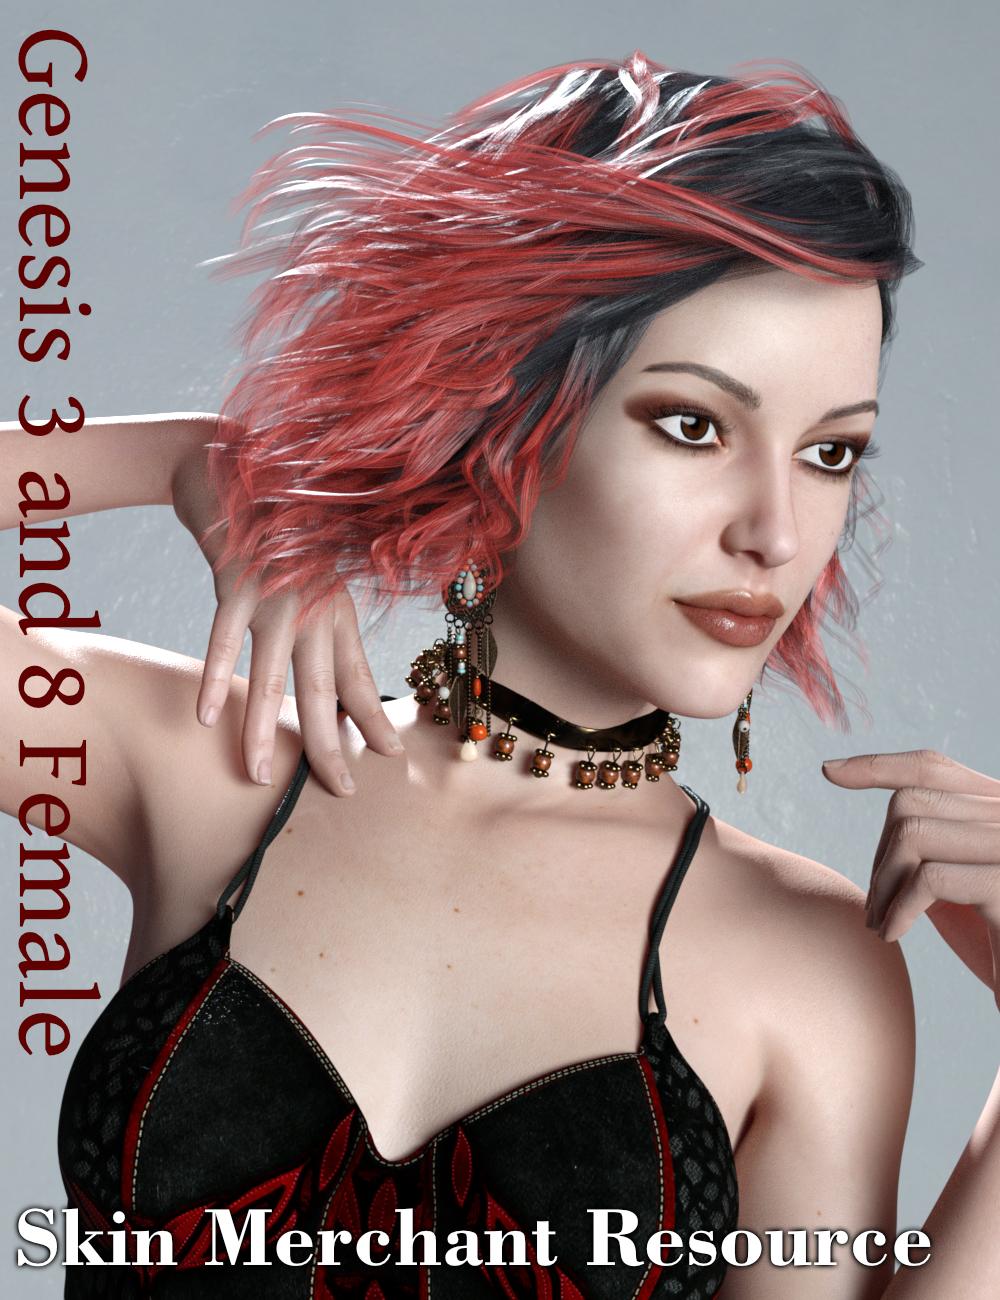 Genesis 3 and 8 Female(s) Texture Merchant Resource (Pale Skin) by: Vyusur, 3D Models by Daz 3D